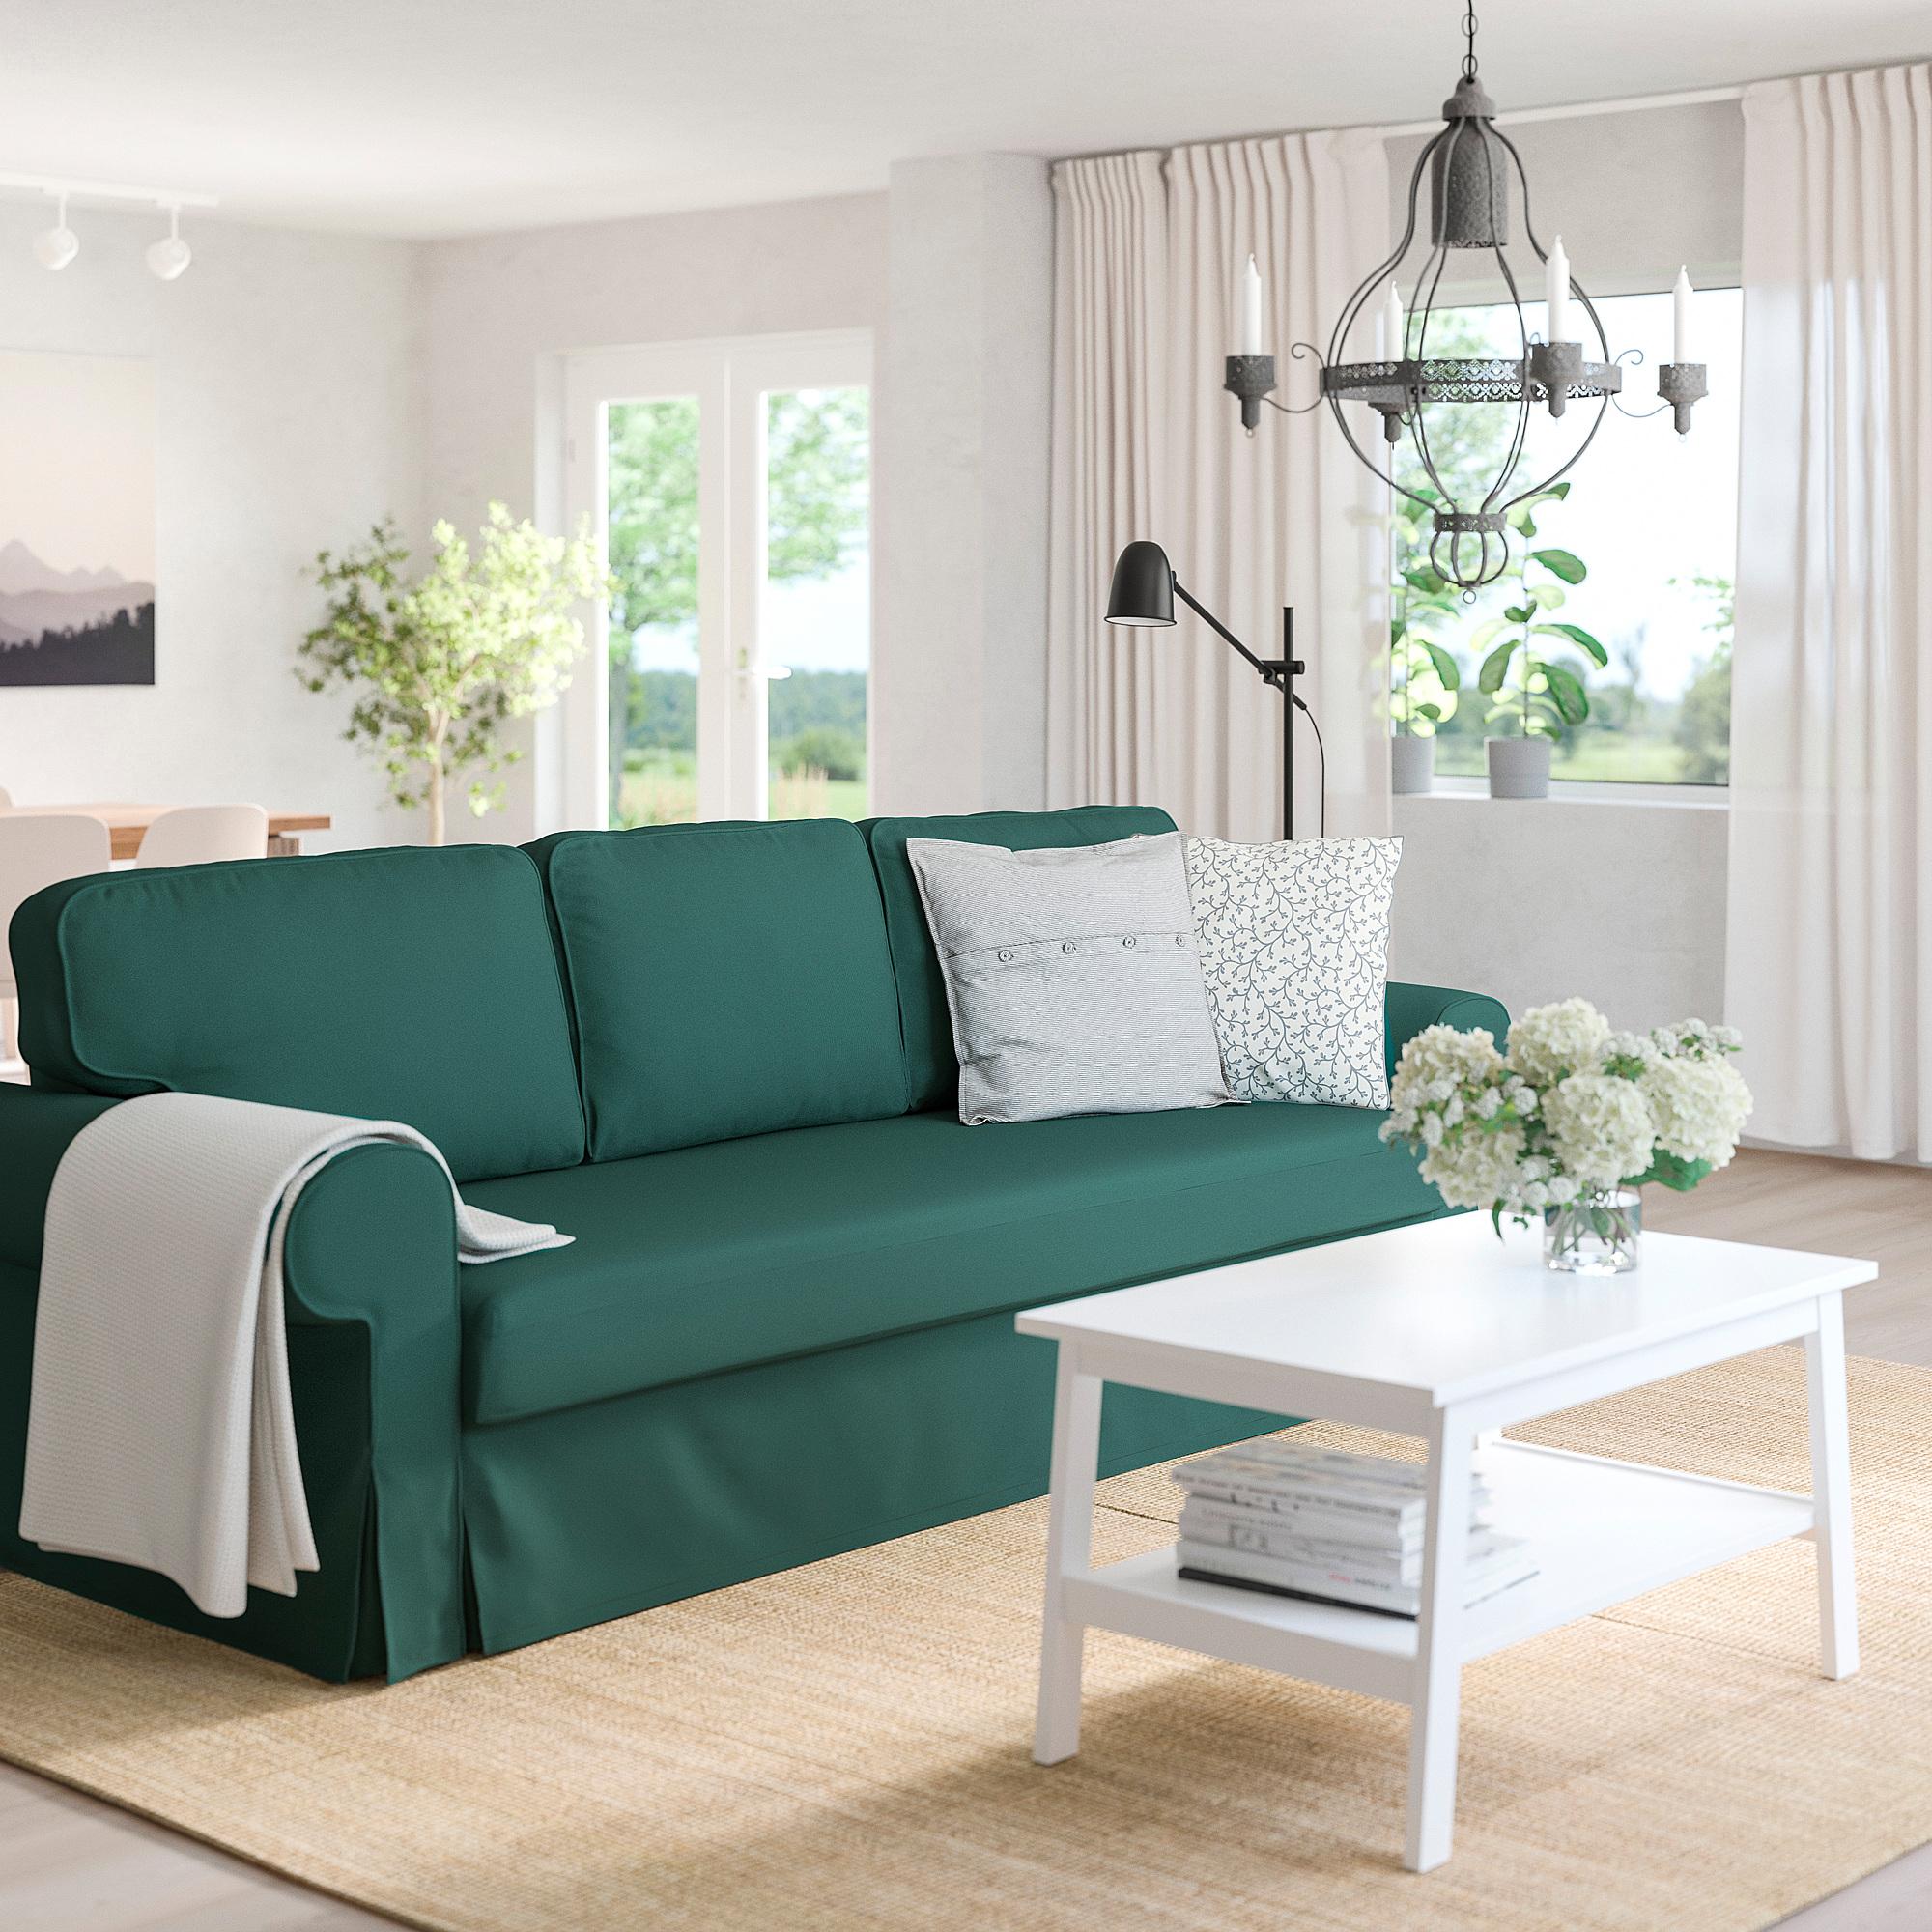 VRETSTORP   3 seat sofa bed, Totebo dark turquoise   IKEA ...